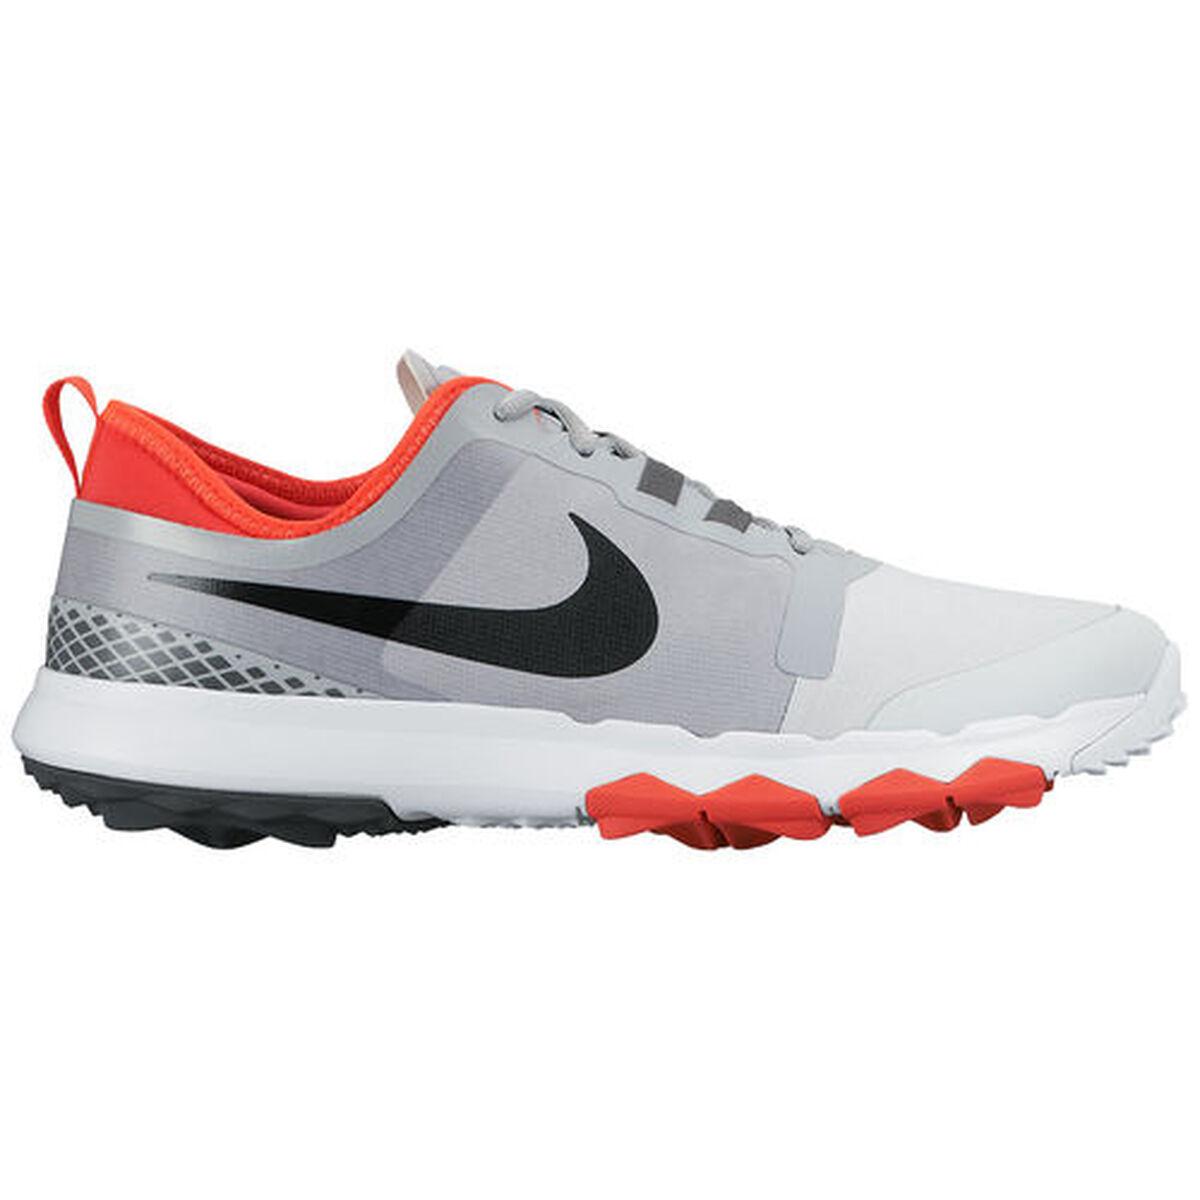 6d9f4433728c Images. Nike FI Impact 2 Men  39 s Golf Shoe ...